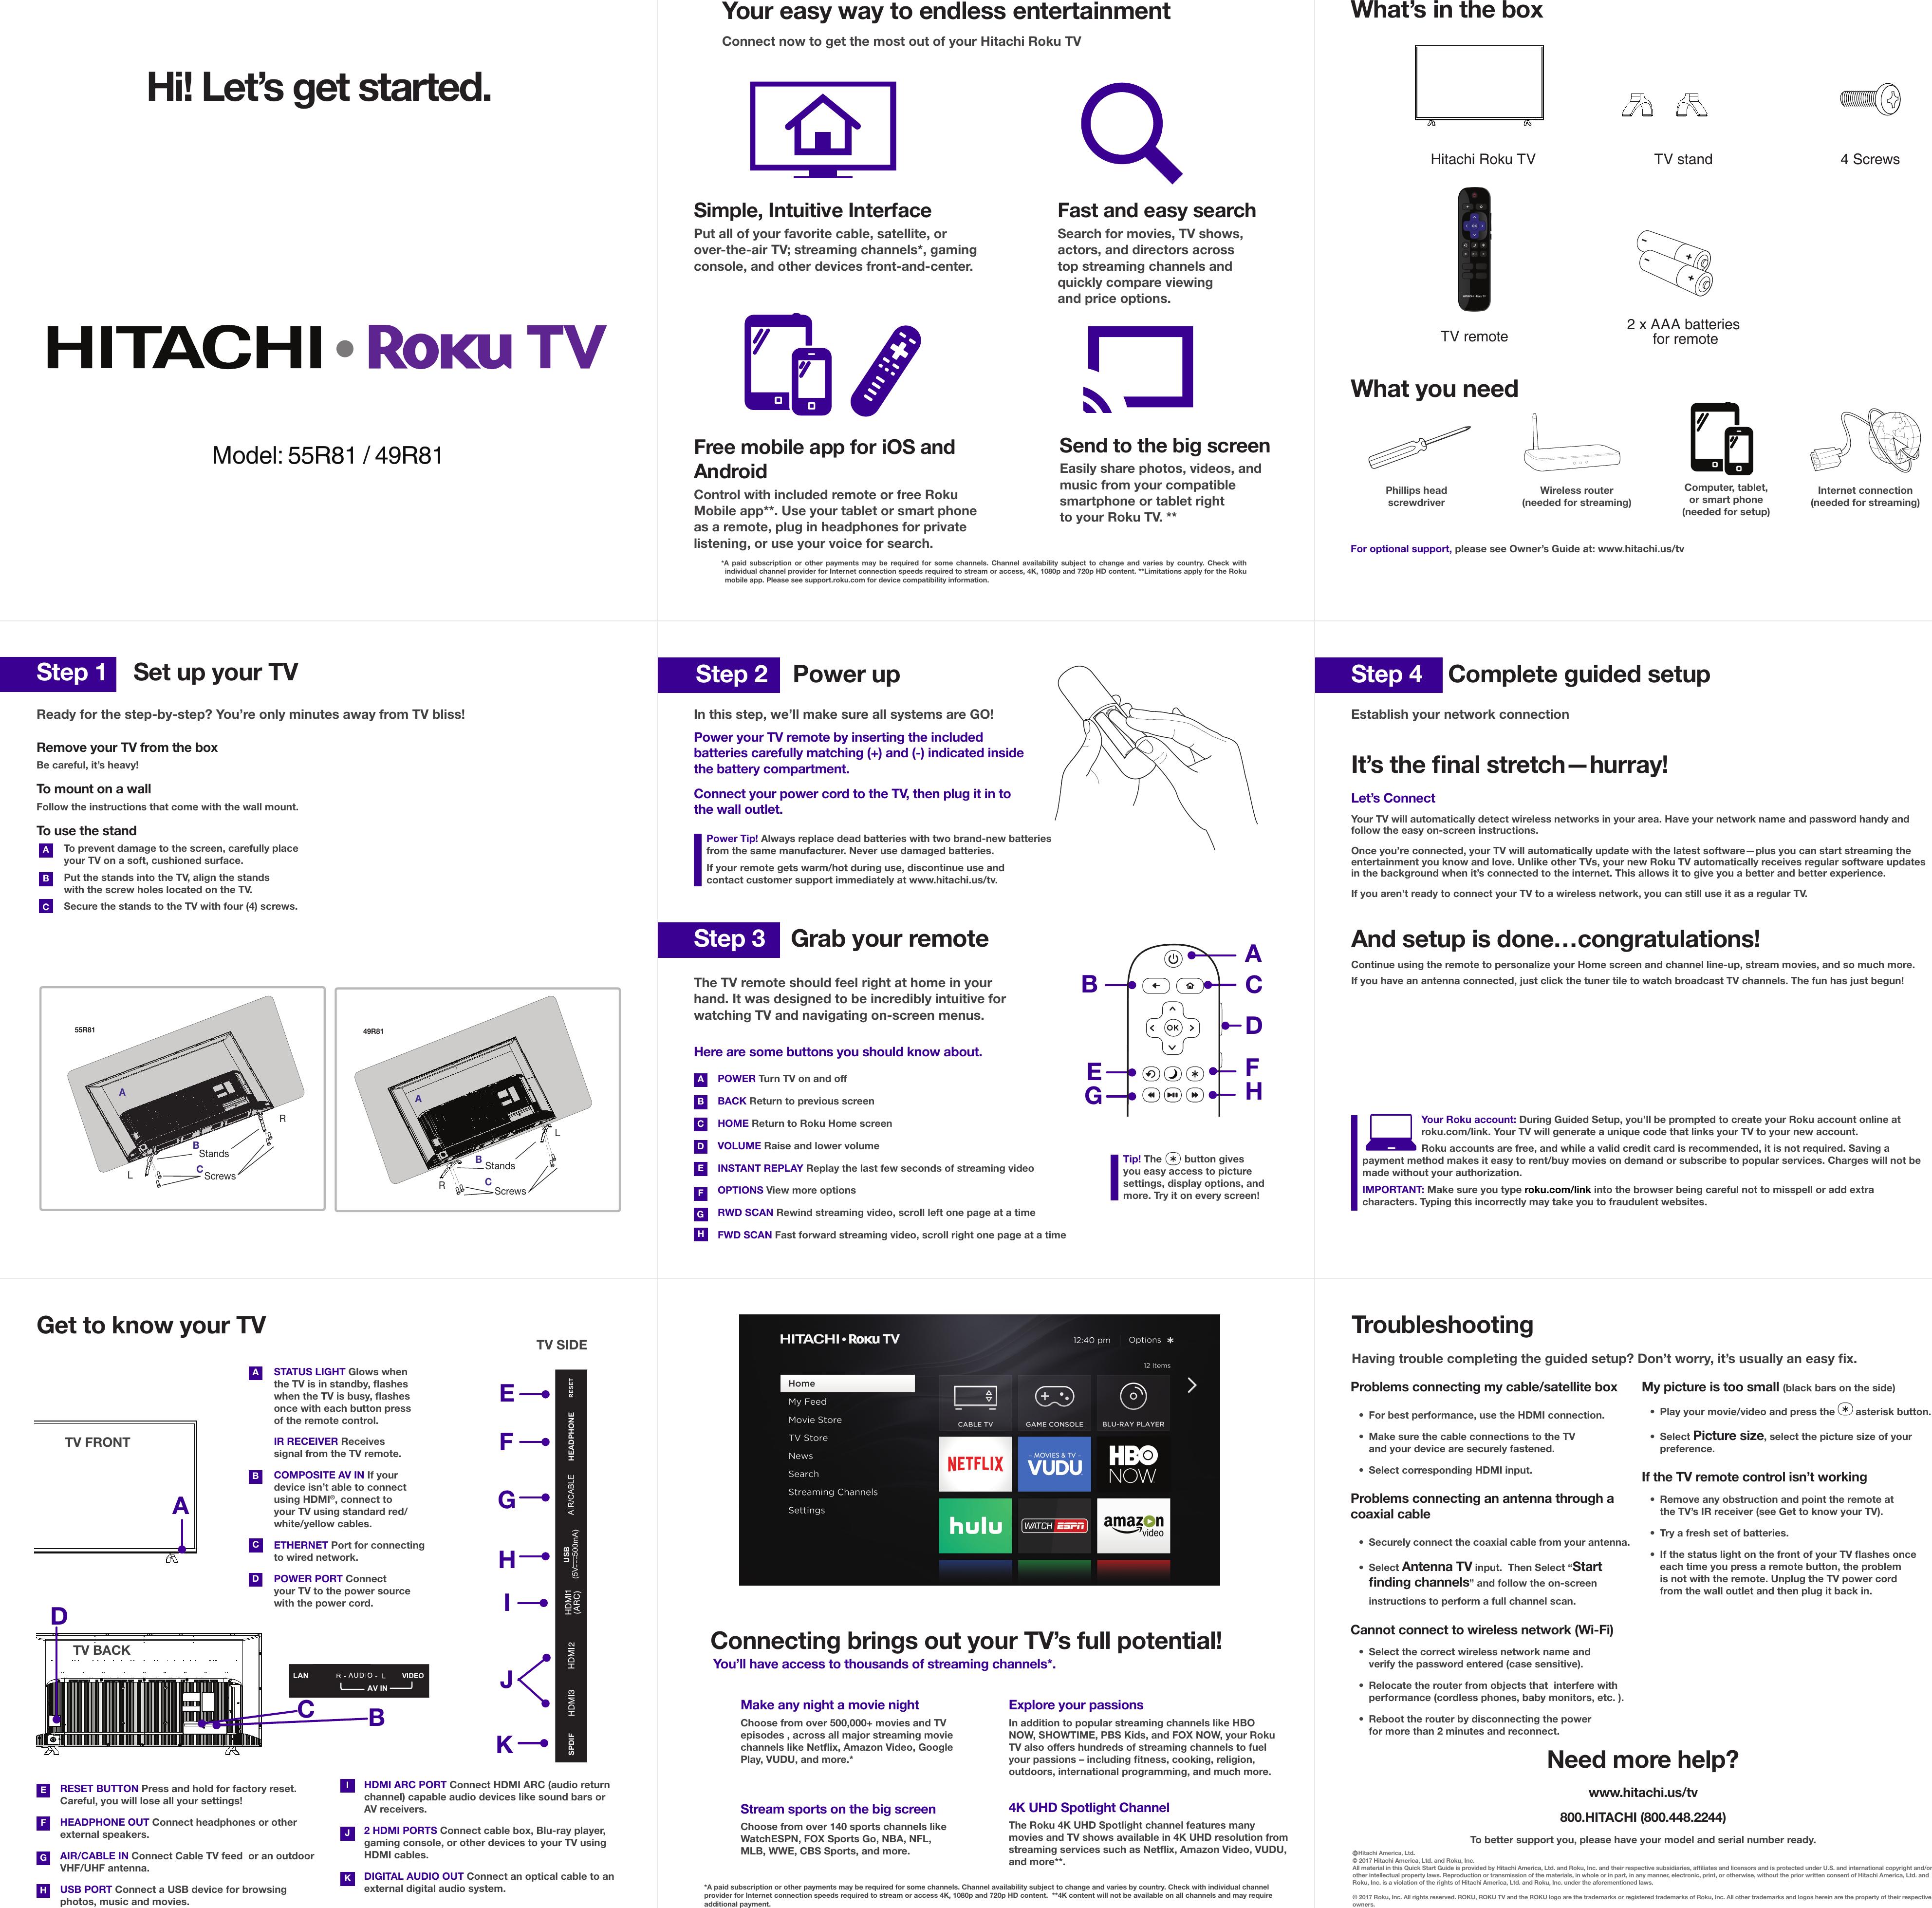 Hitachi Quick Start Guide Qsg Roku R81 11292017 R1 Player Setup Netflix Streaming Movies